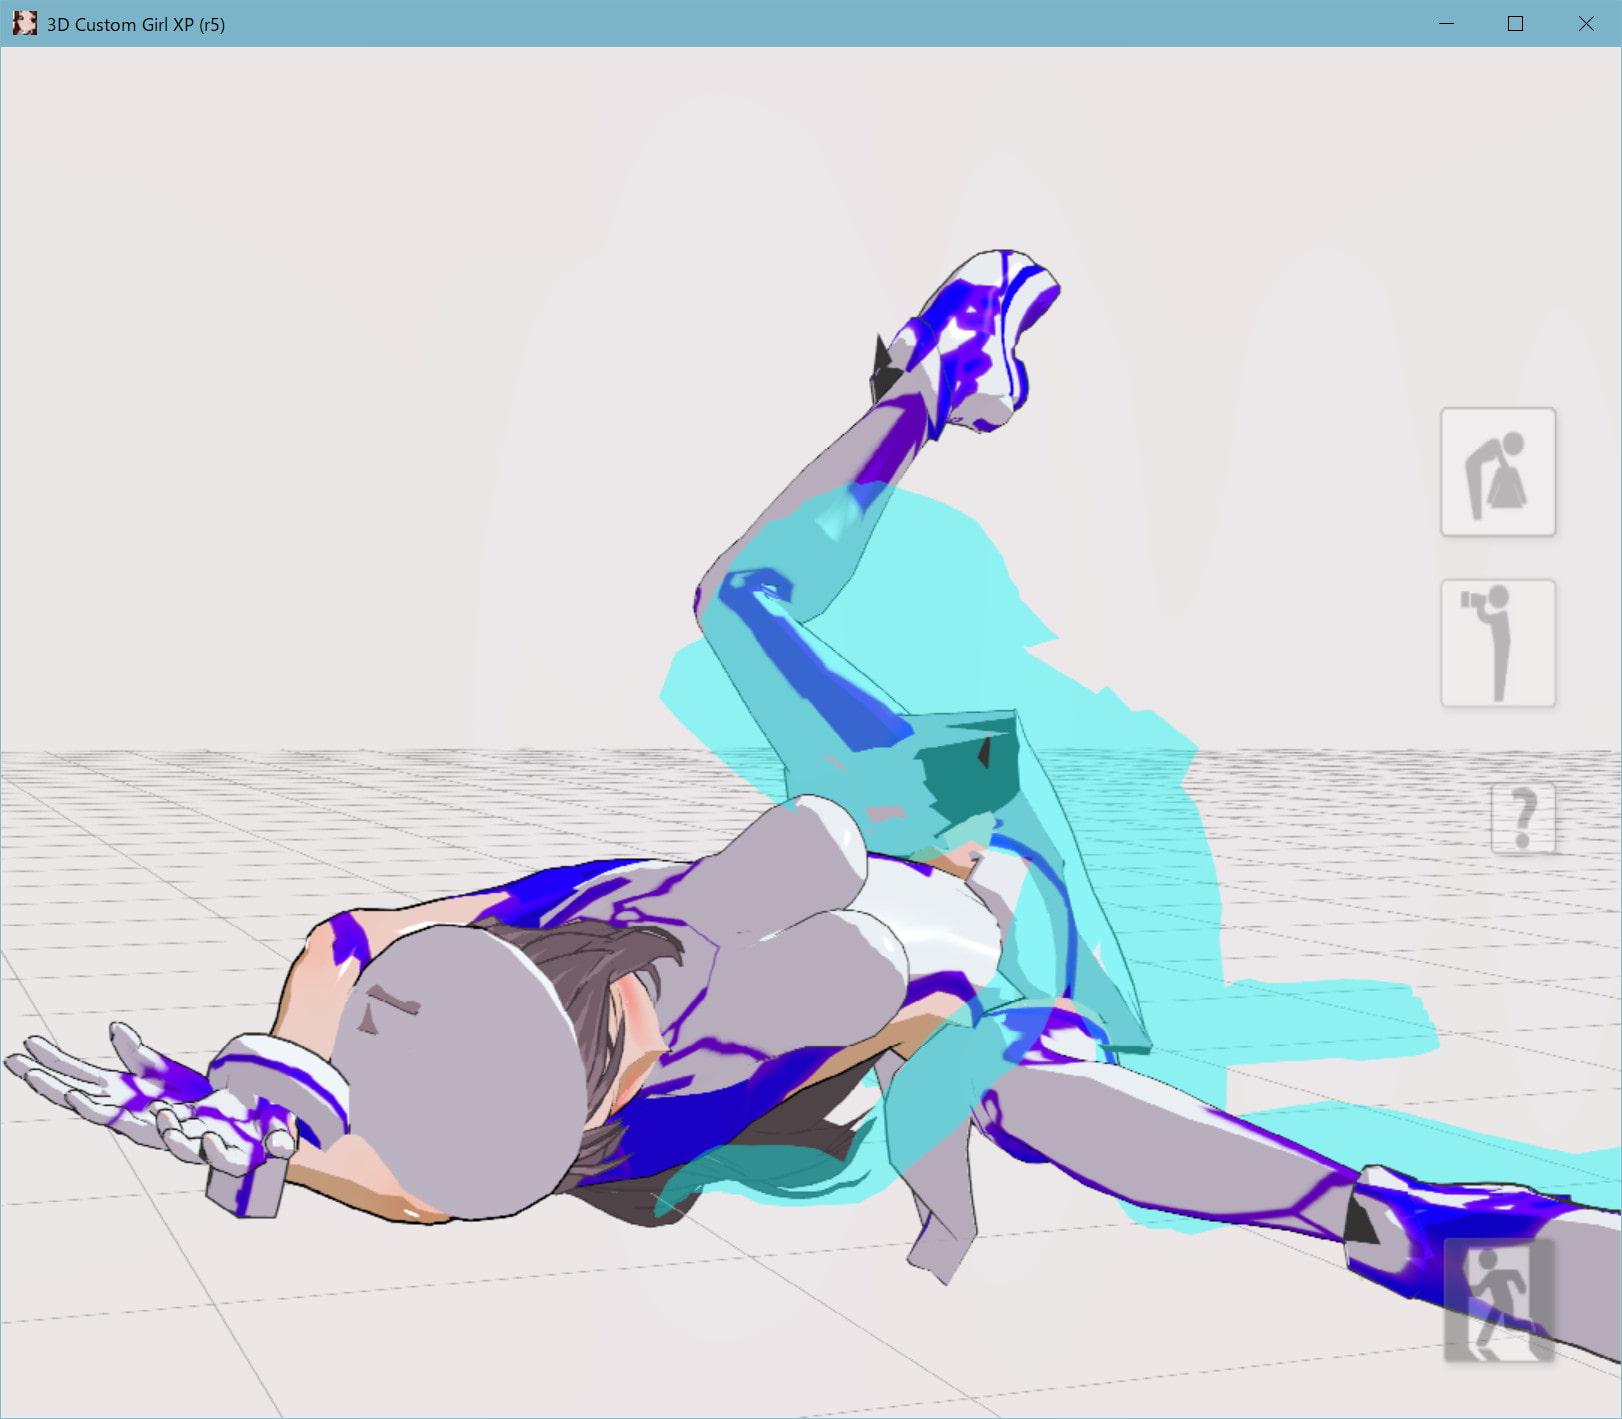 RJ321058 3Dカスタム少女追加モーション正常位smallpack2 [20210318]